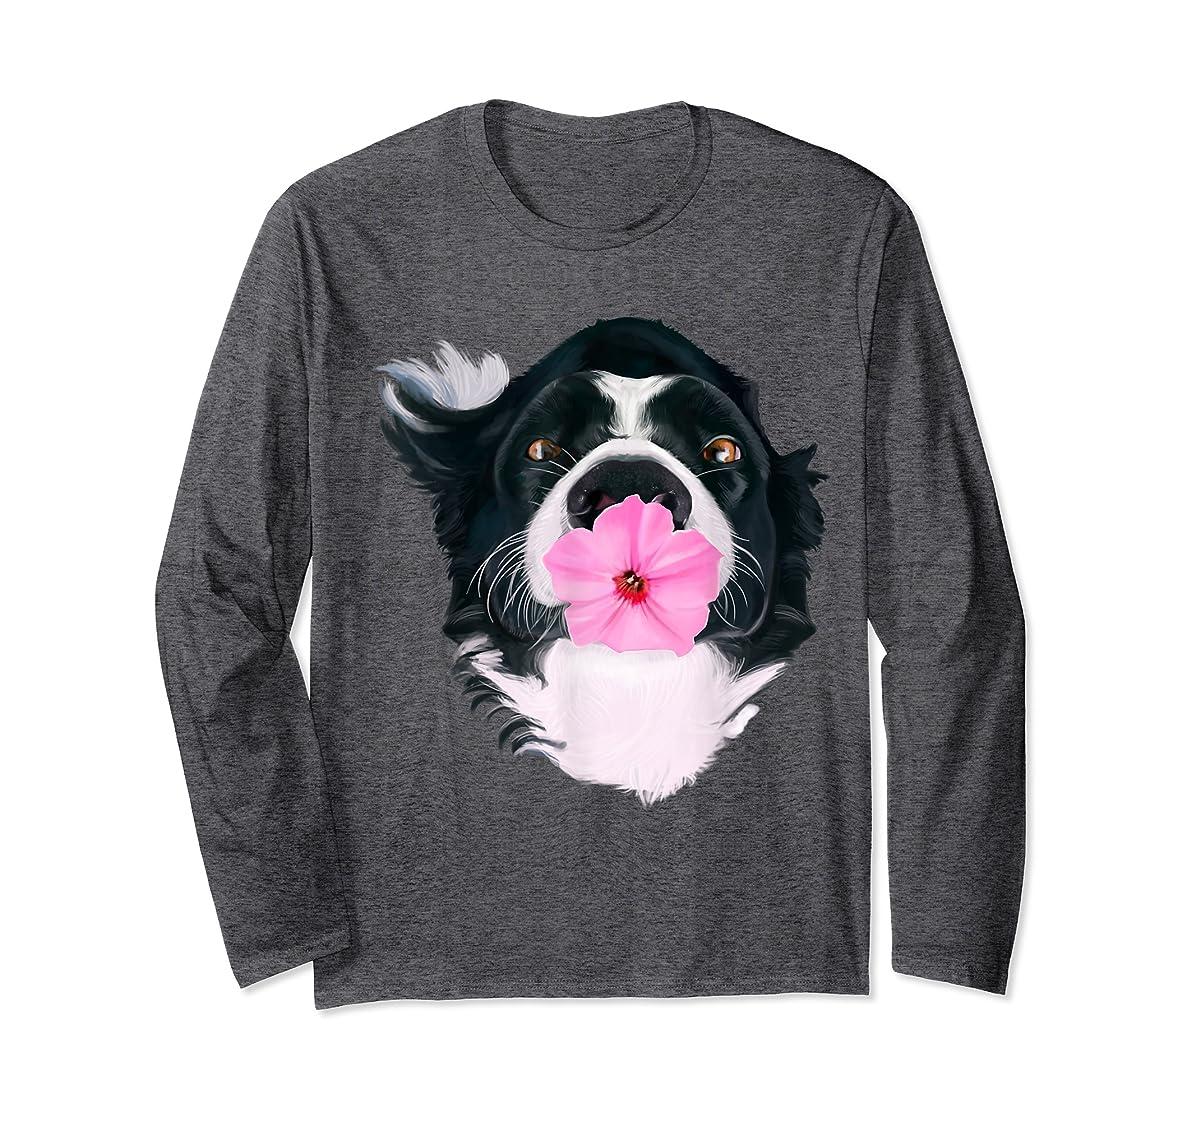 Border Collie Sweet Dog T-Shirt Dogs Tee Shirt Gifts-Long Sleeve-Dark Heather